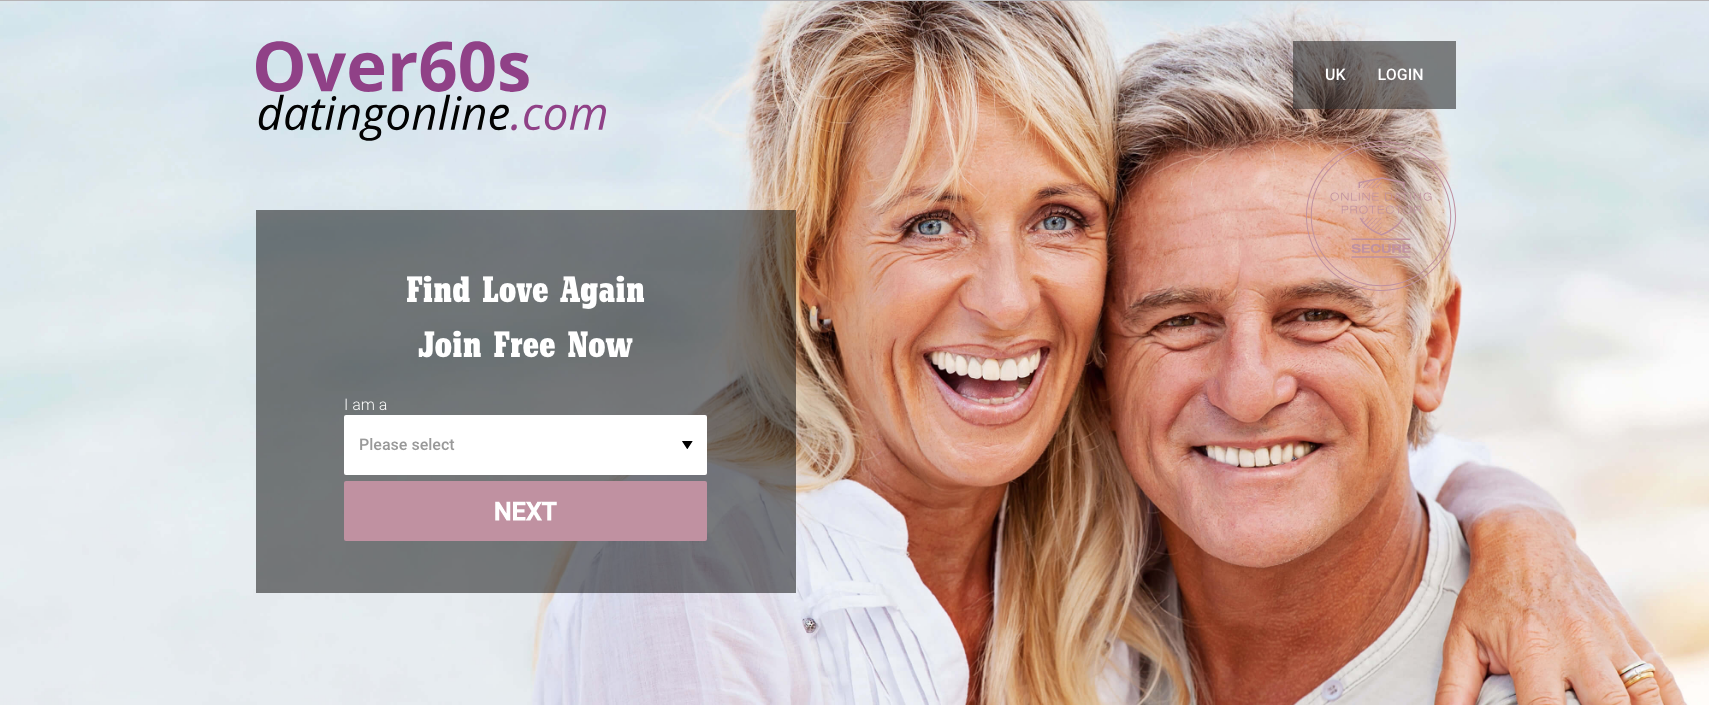 Замуж за иностранца. Сайты знакомств 50+, 60+